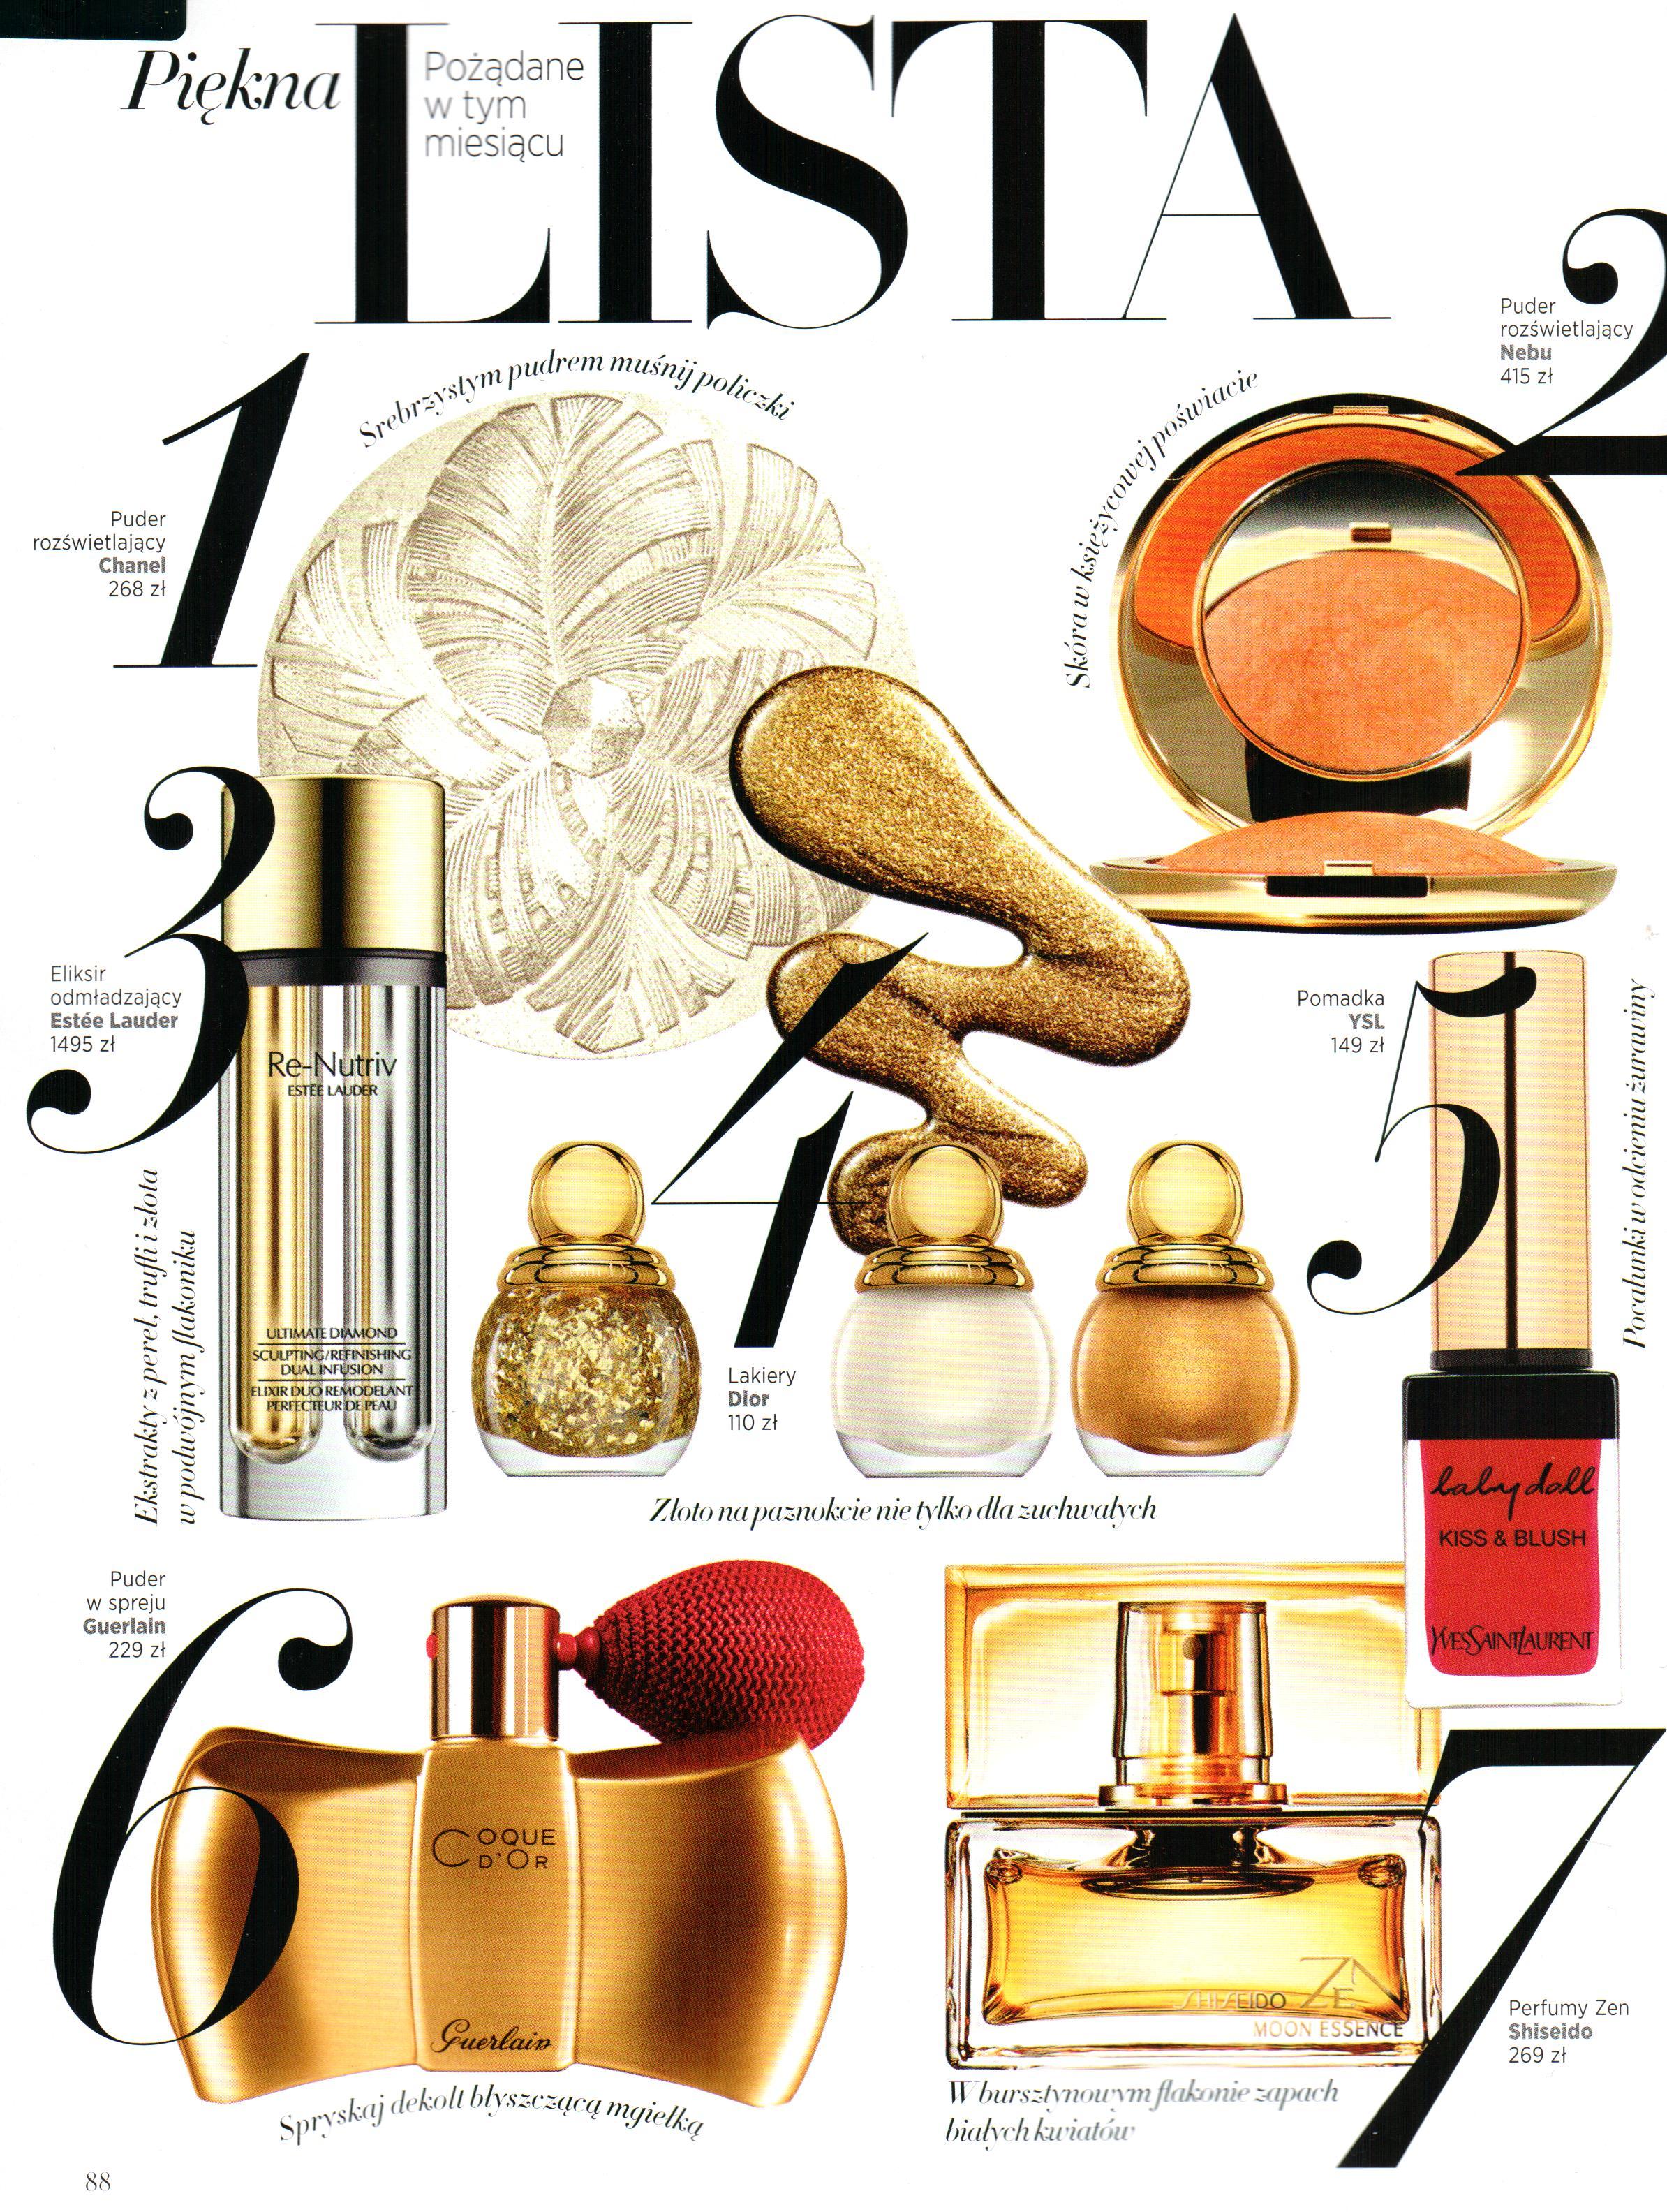 2015.01-02 Harper's Bazaar_NEBU MILANO